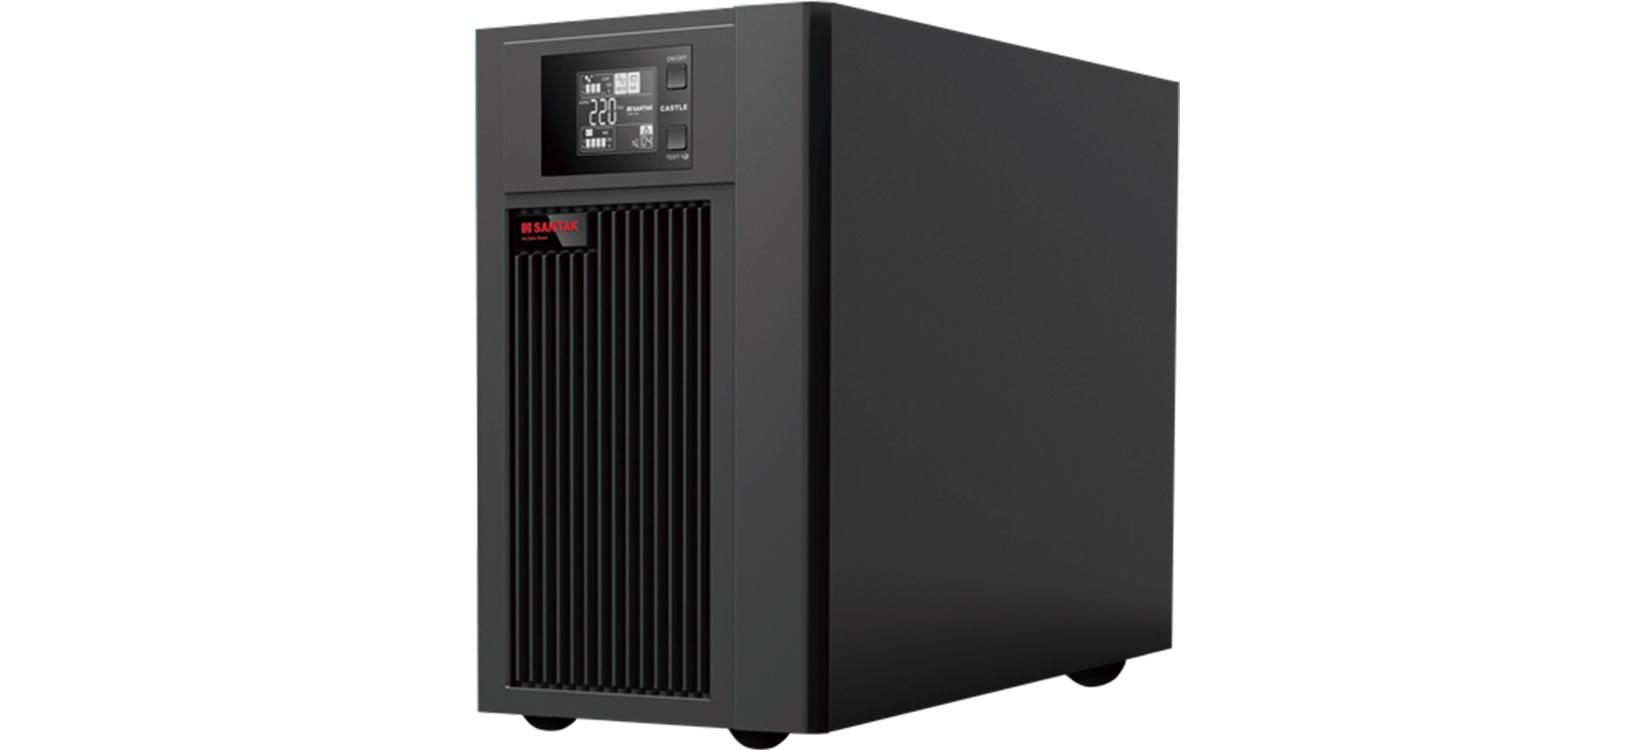 Bộ Lưu Điện UPS Santak True Online 3KVA C3K